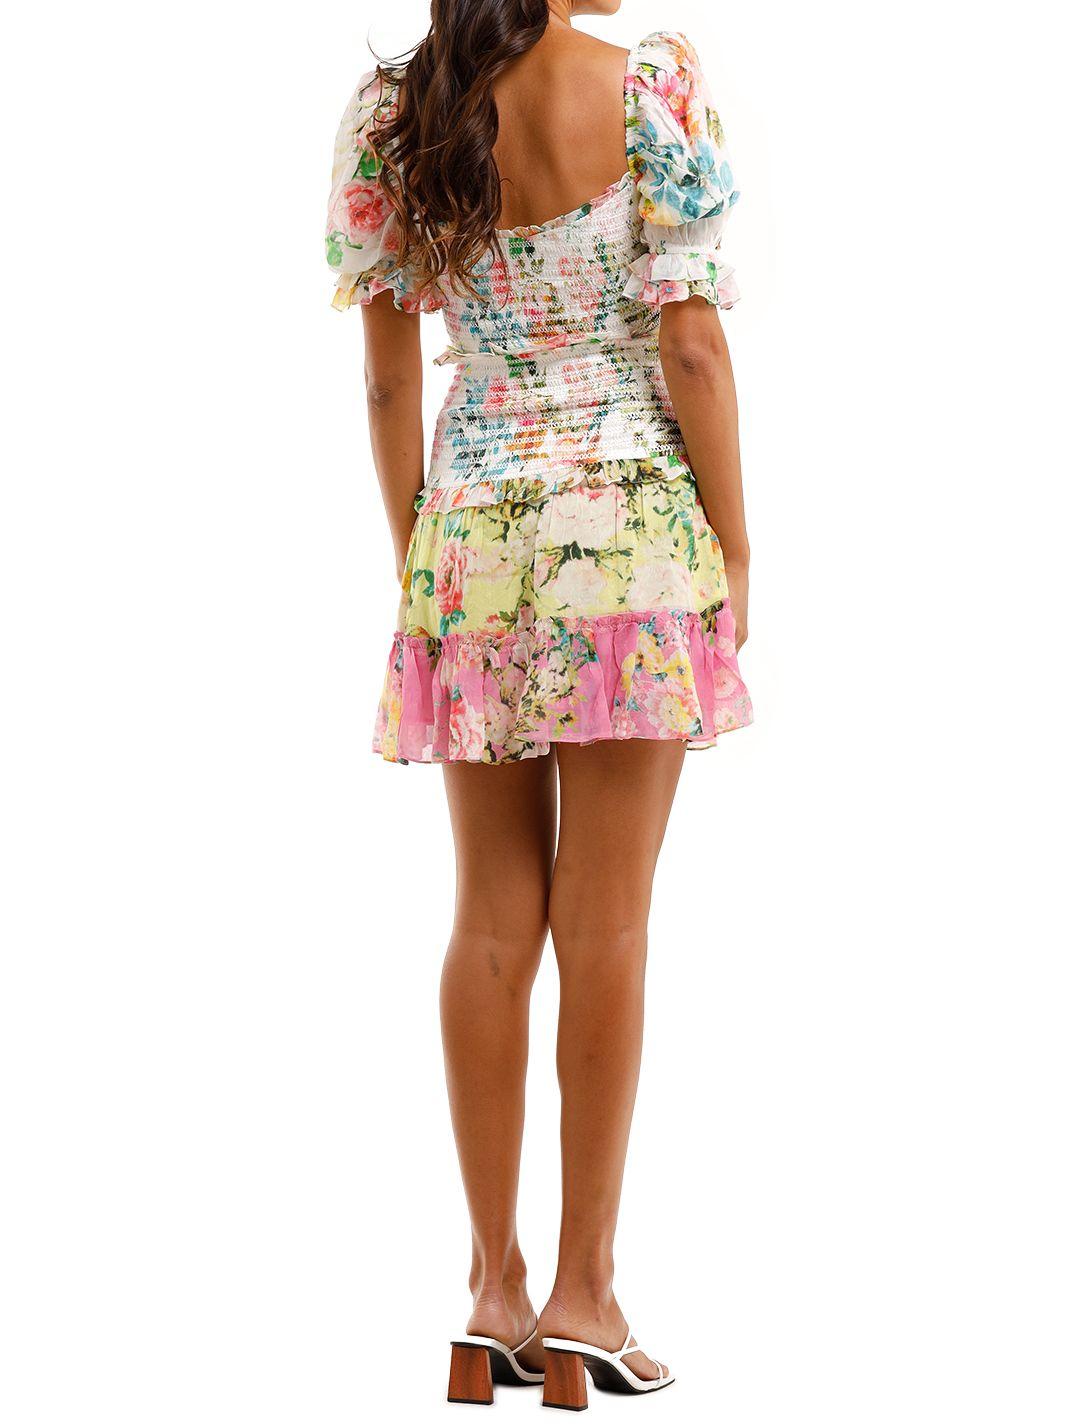 Hemant & Nandita Jolie Mini Dress Floral